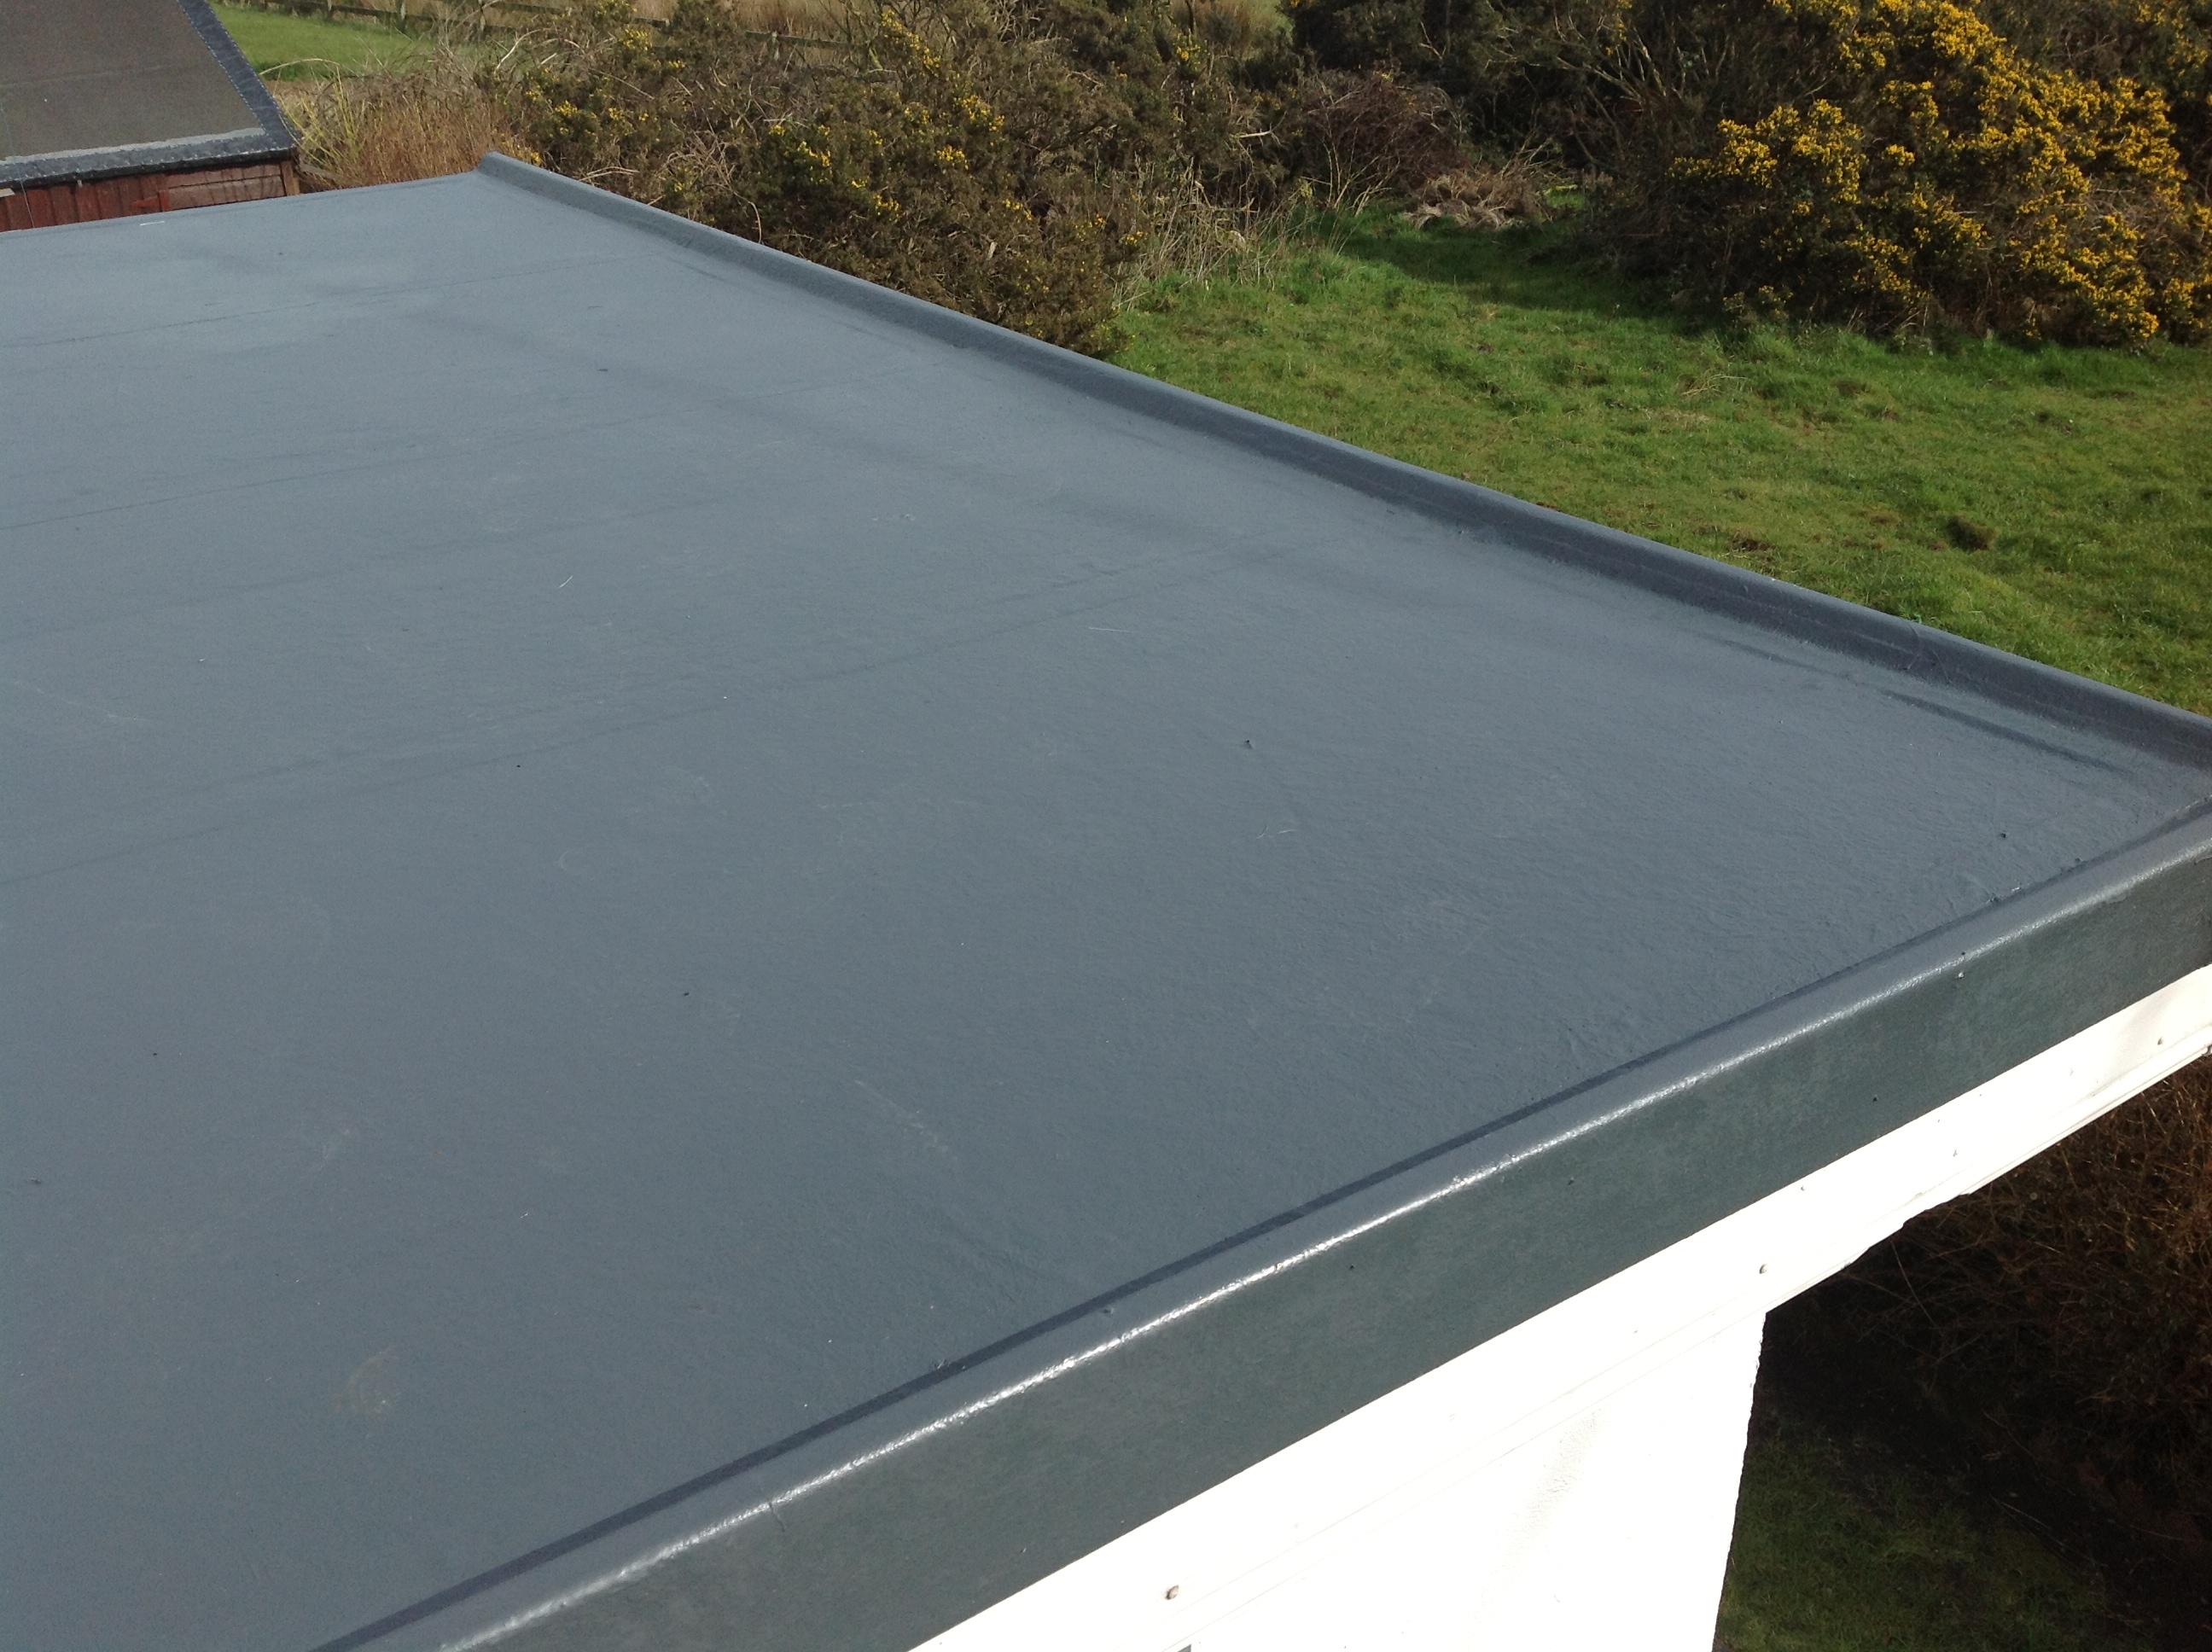 Grp Fiberglass Roofing